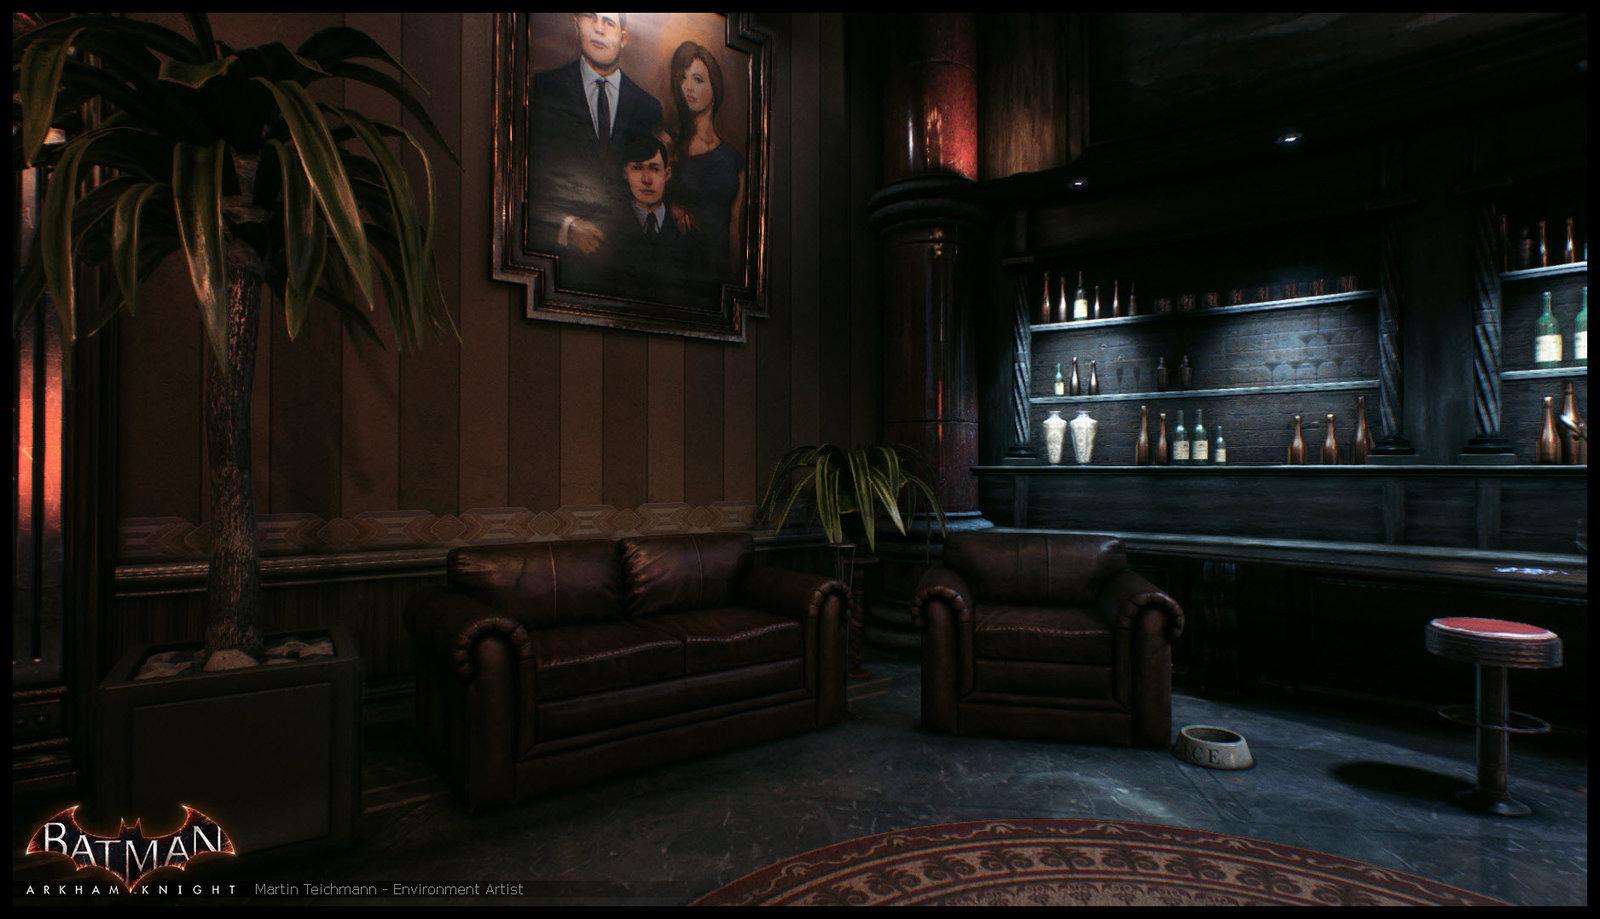 Batman Arkham Knight - Wayne Office